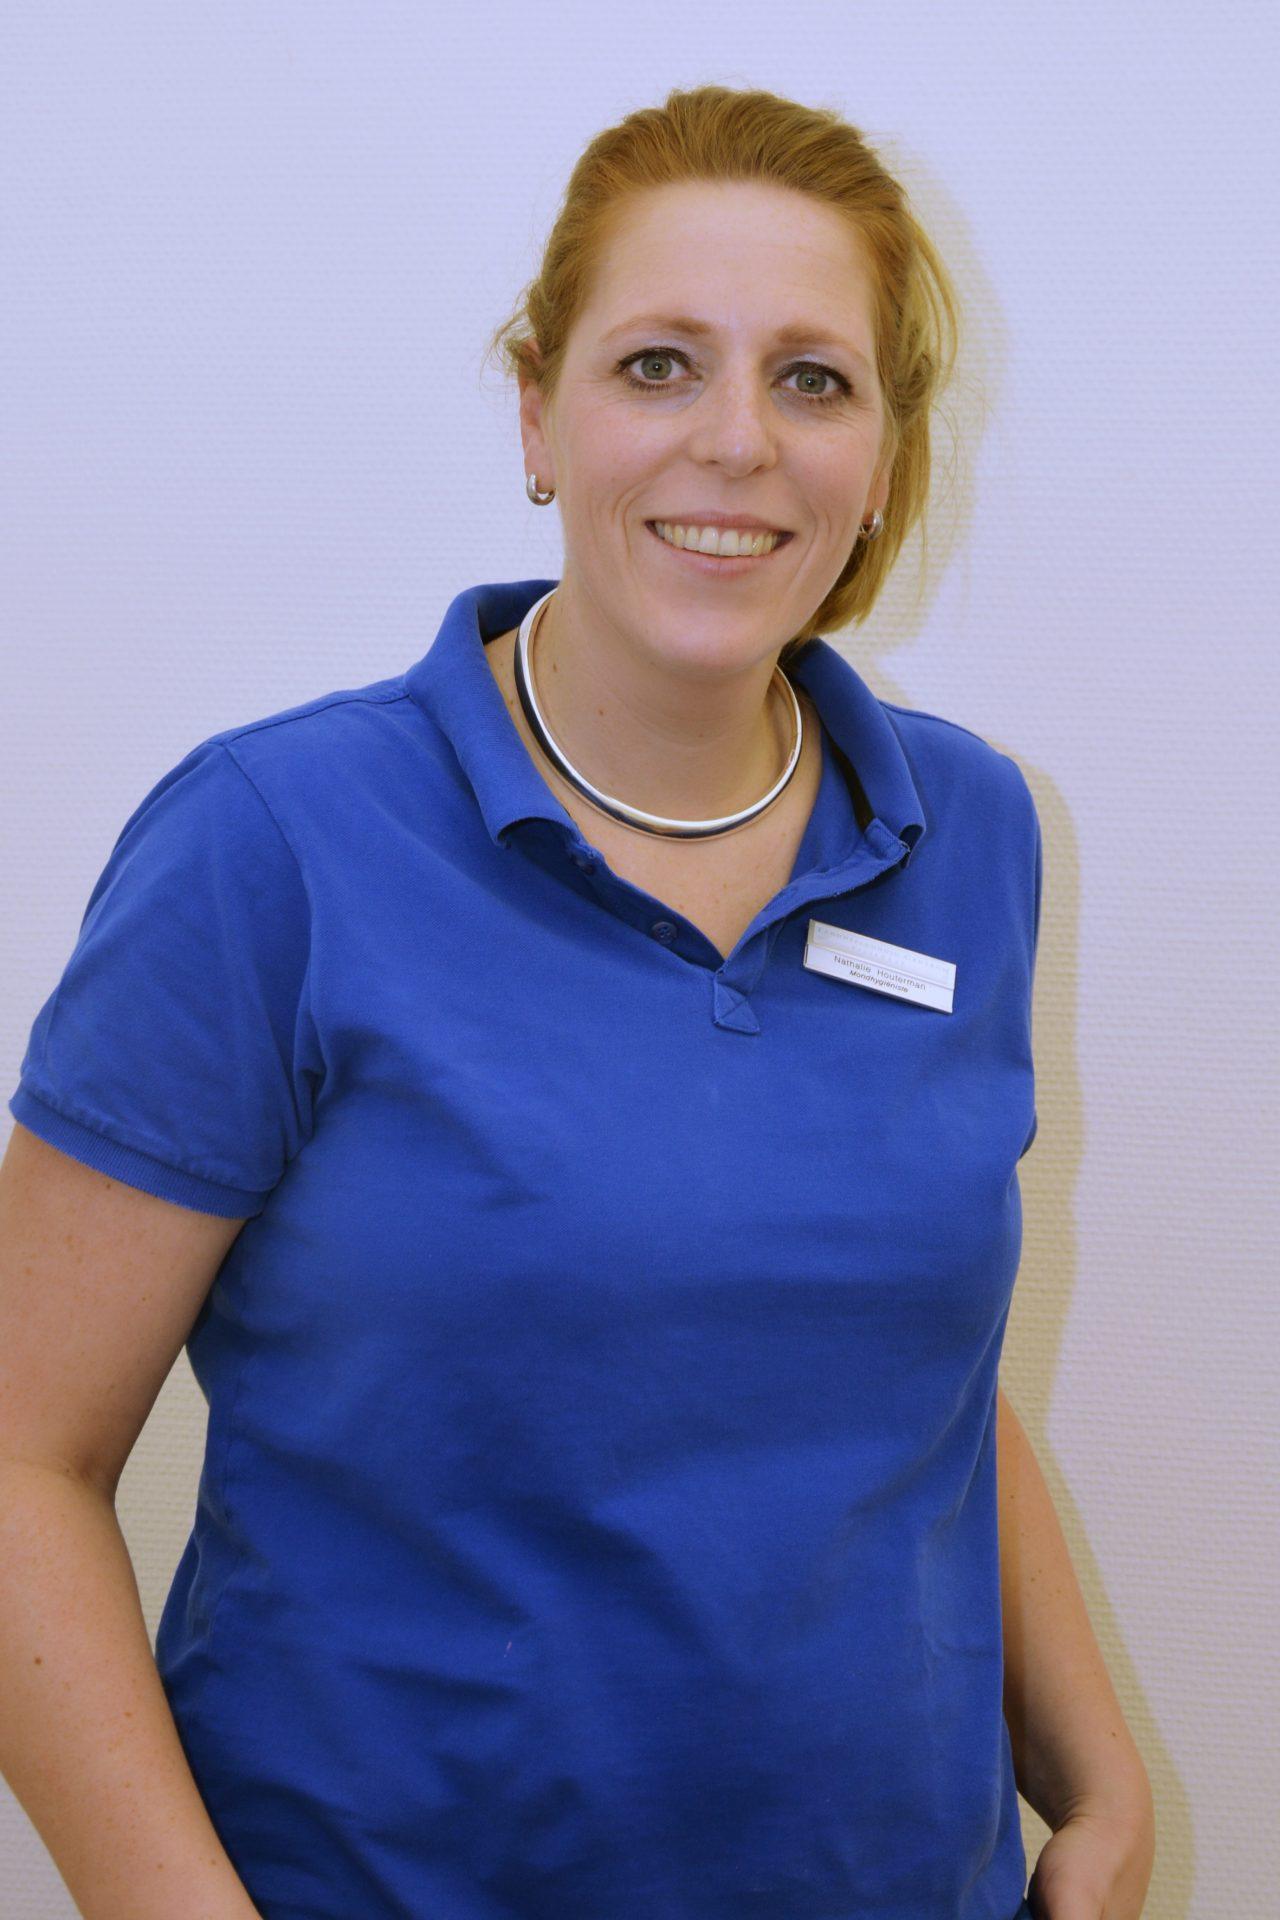 Nathalie Houterman